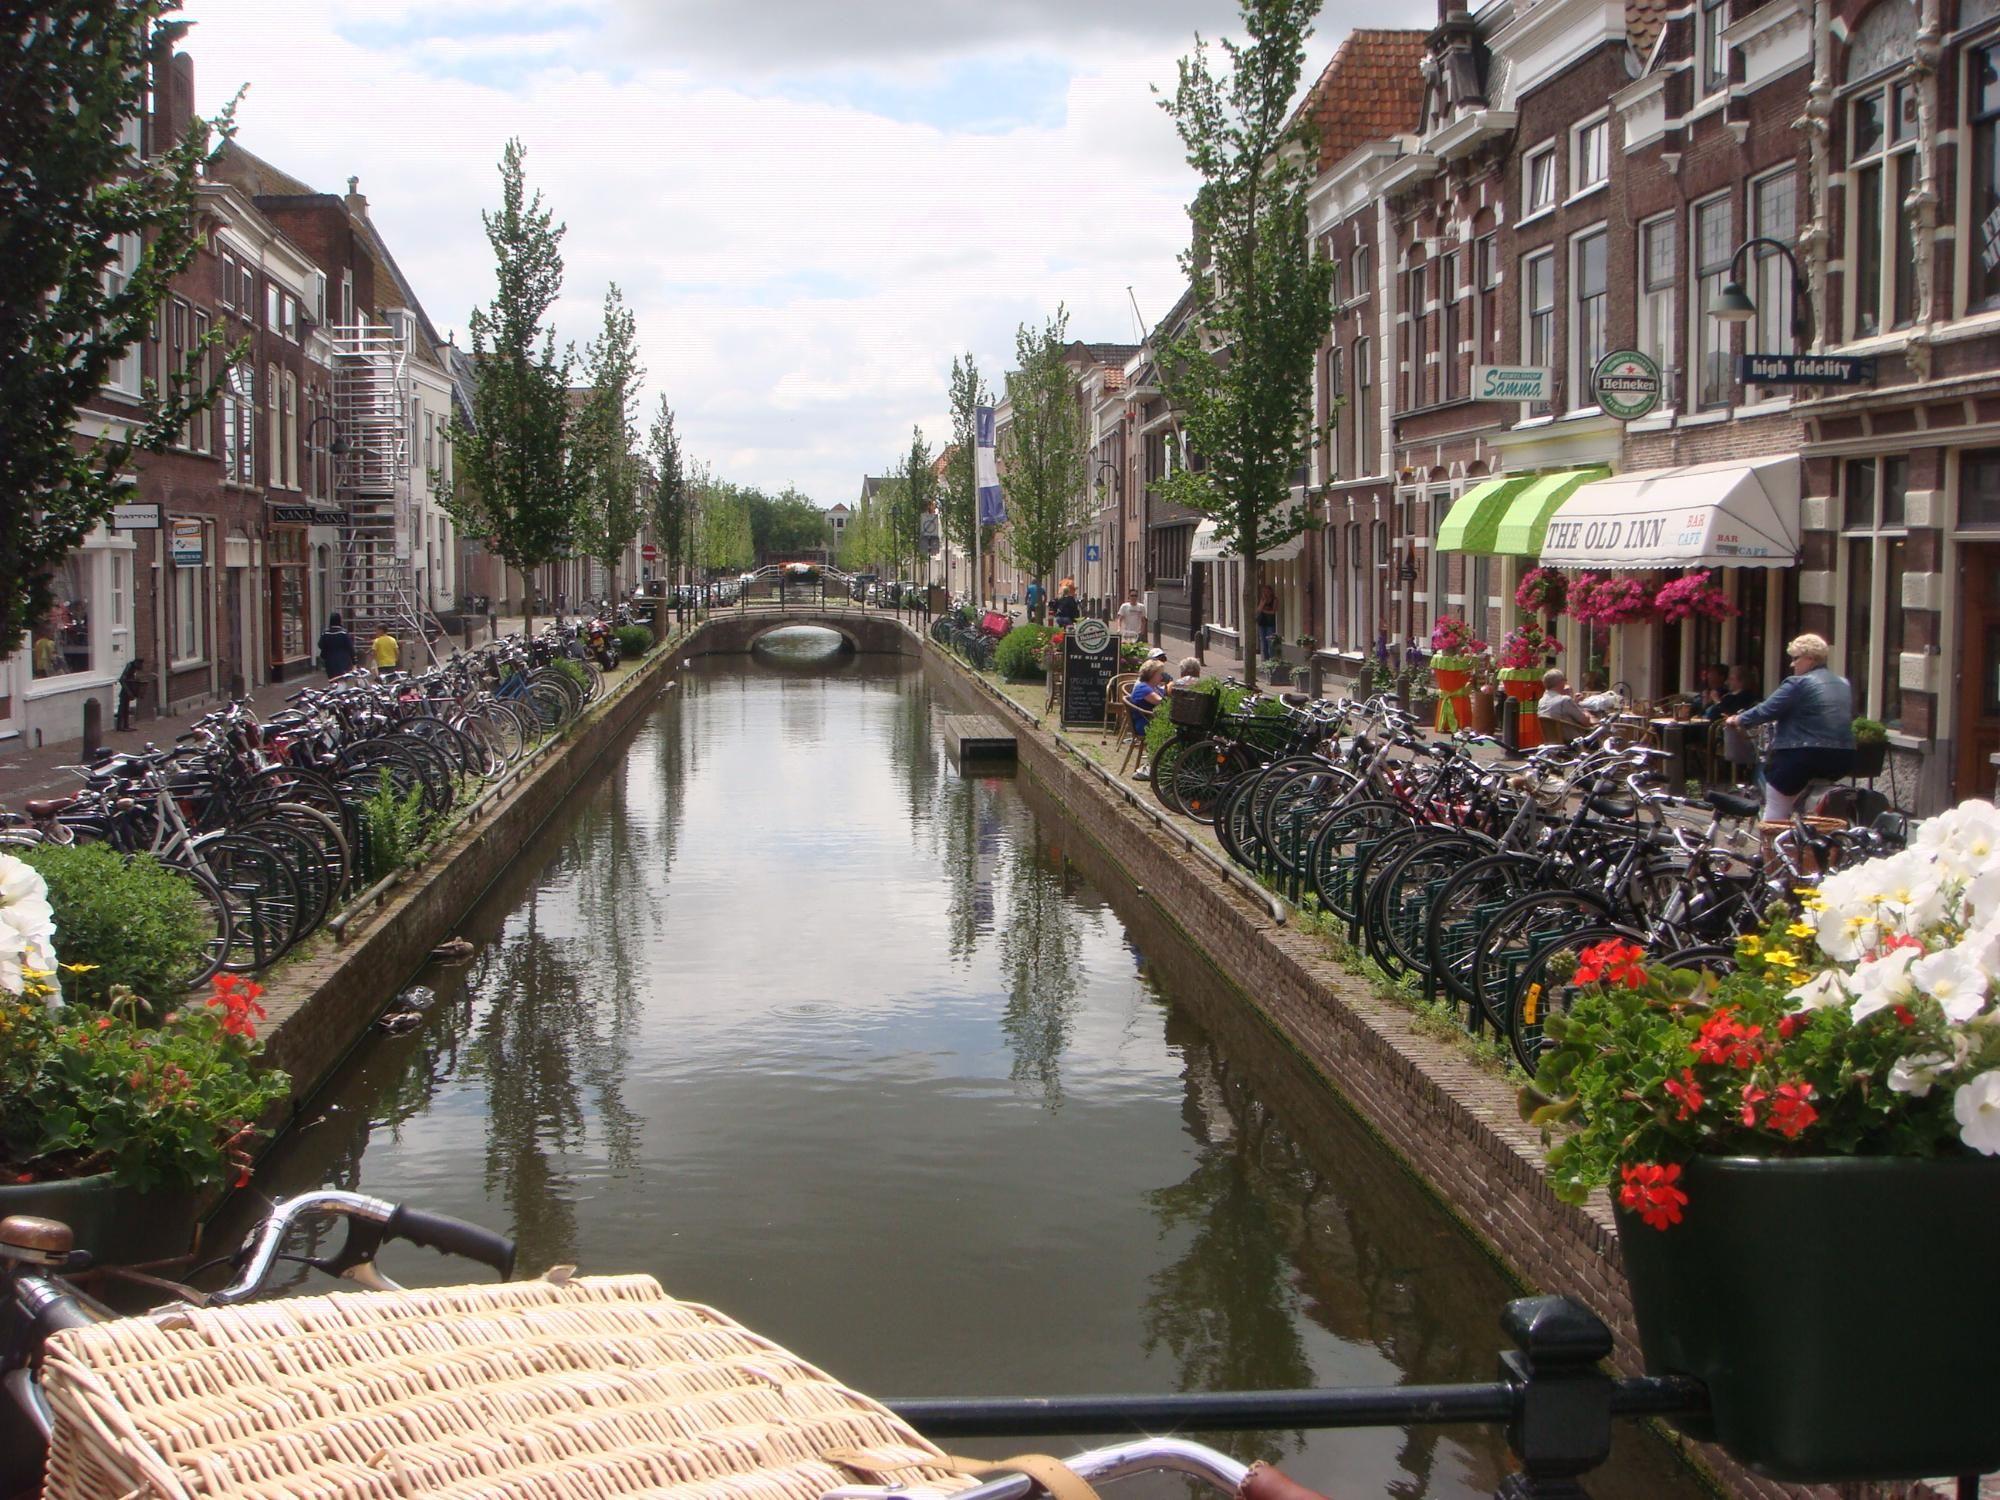 Emperor S Canal Keizersgracht Beautiful Canal Street